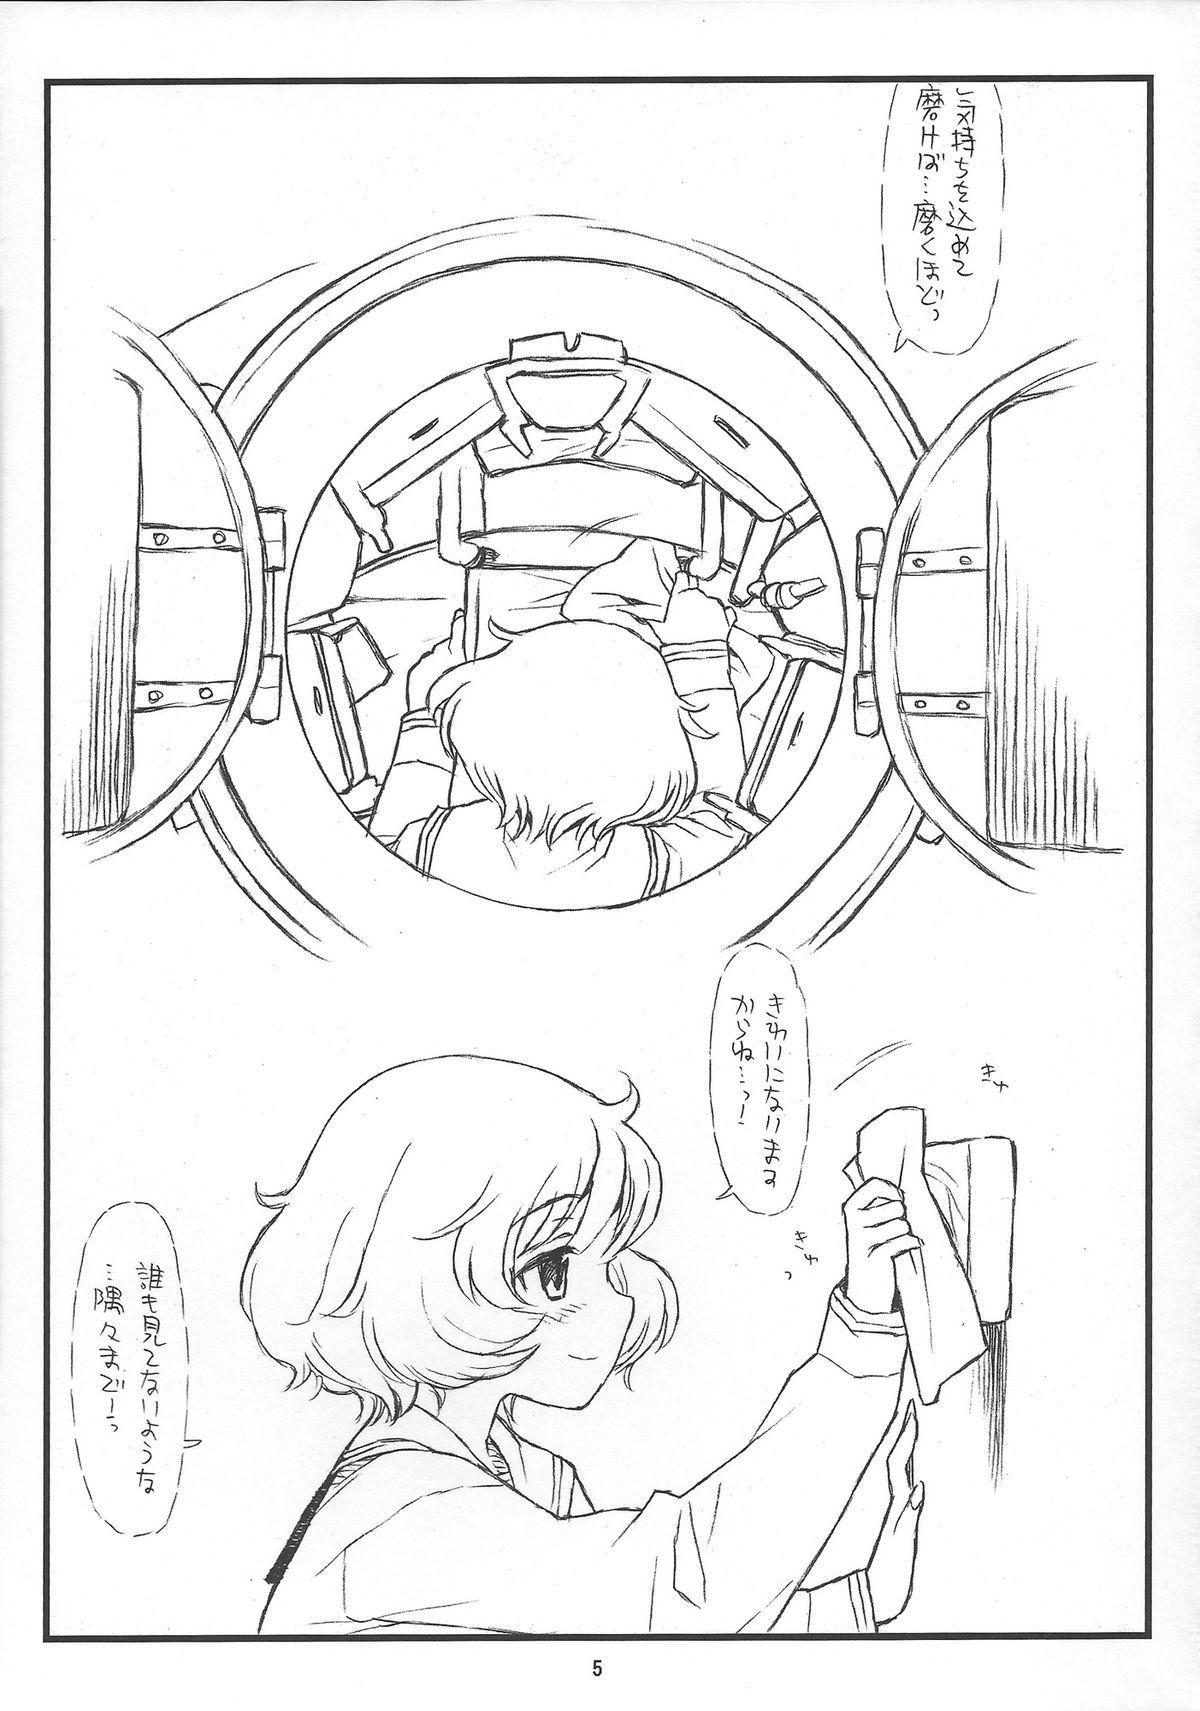 (C84) [bolze.] 「Honanie + Akiyama-dono Sennyudaisakusen (Sippai)」 (Girls und Panzer) 4